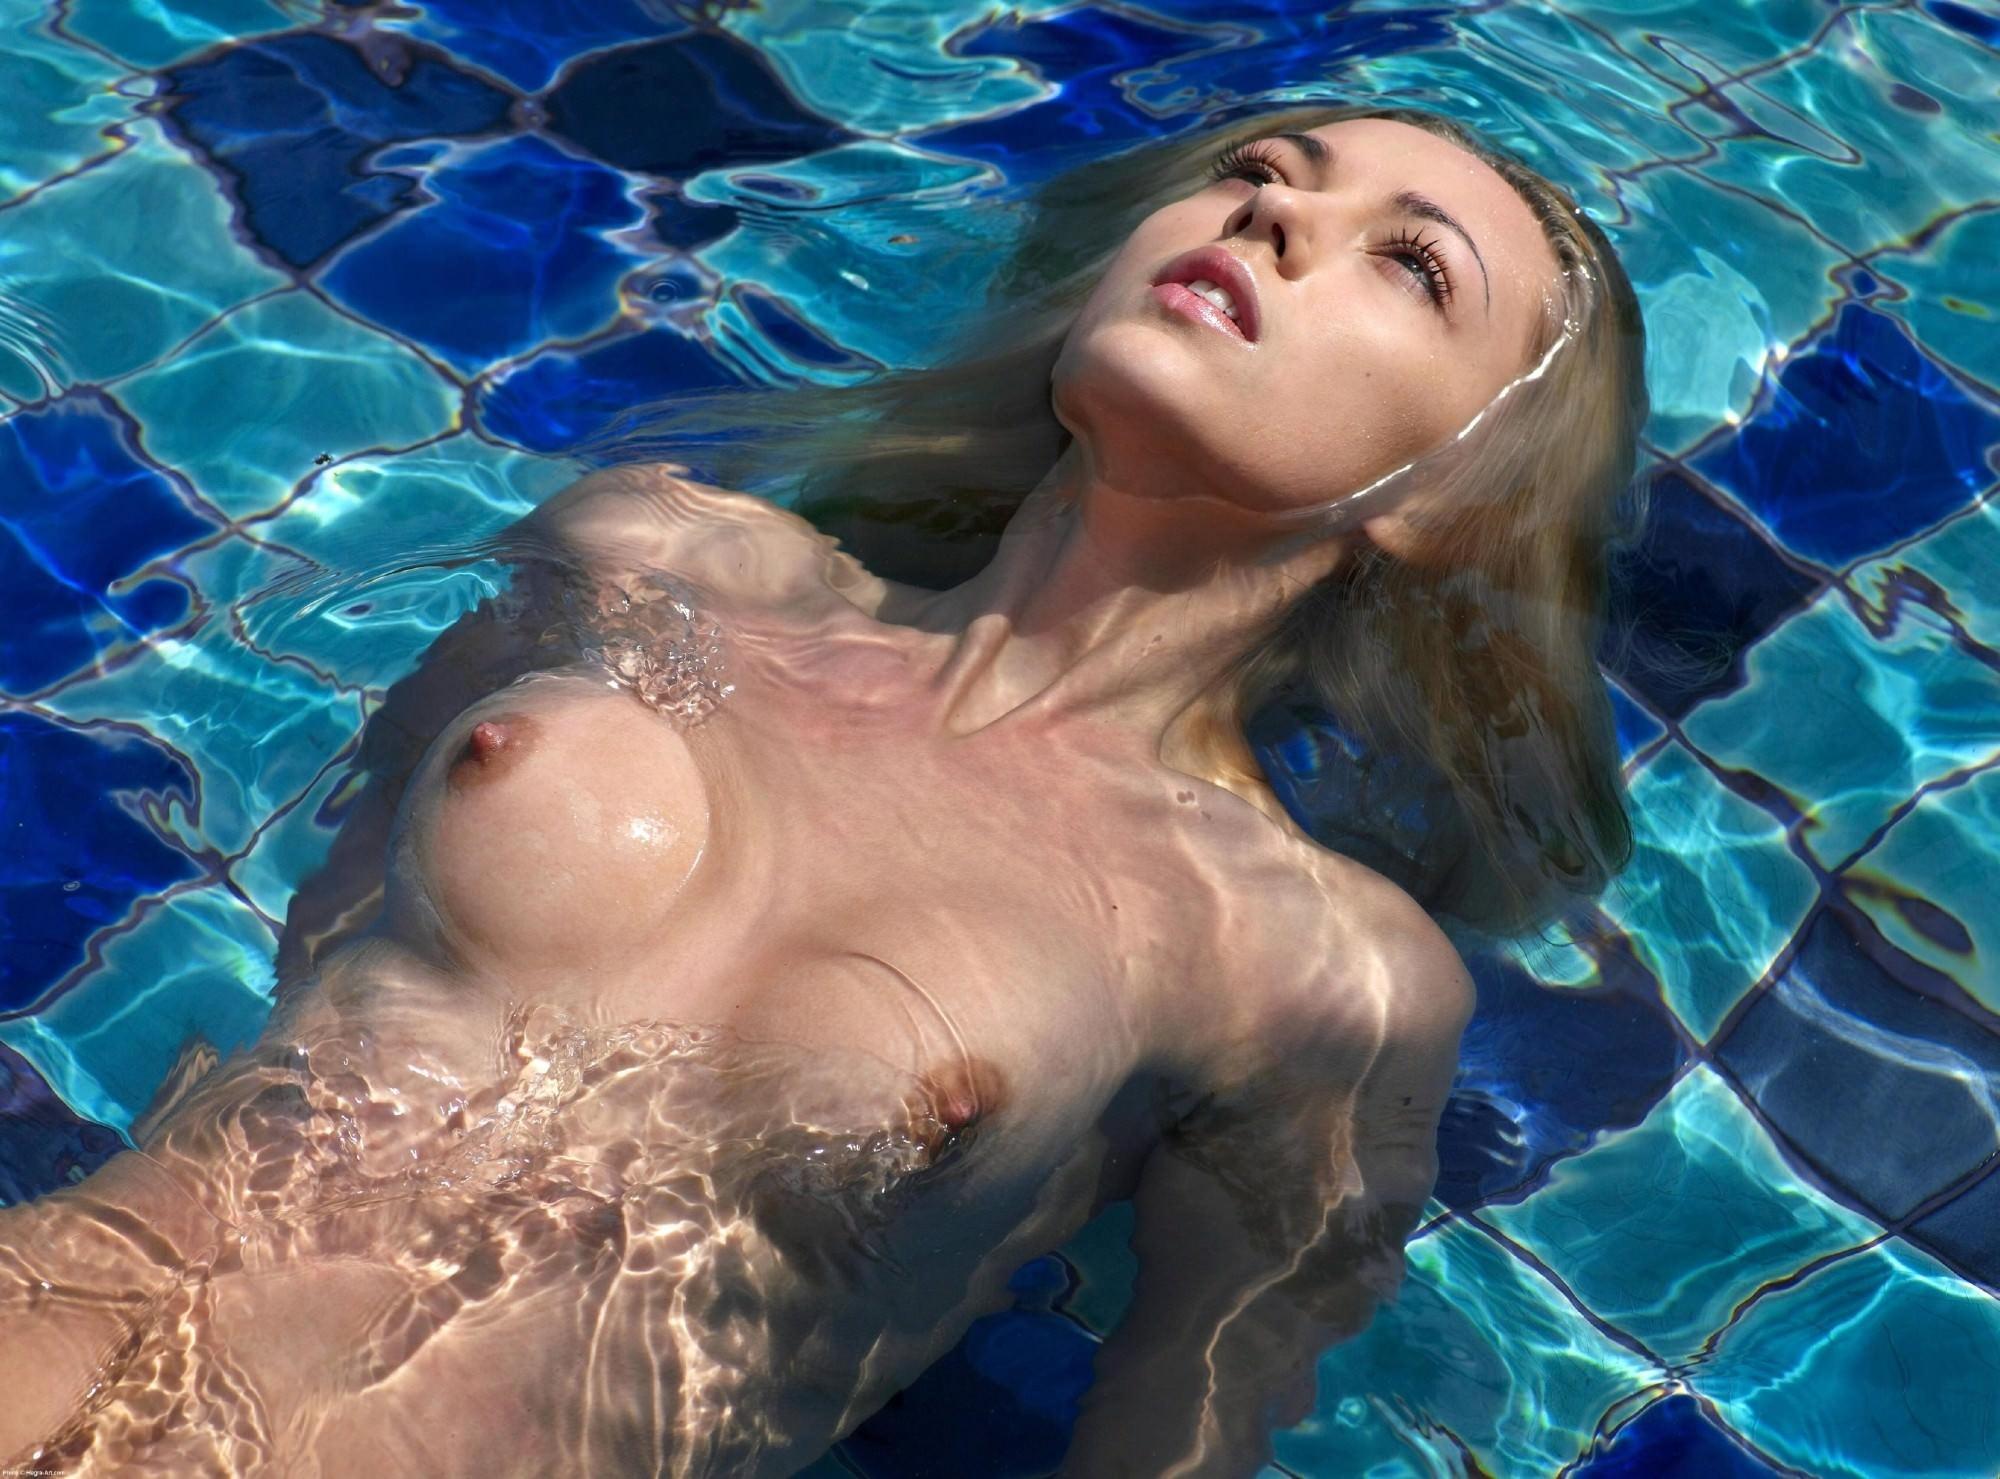 Naked bianca lishansky in oil on water ancensored